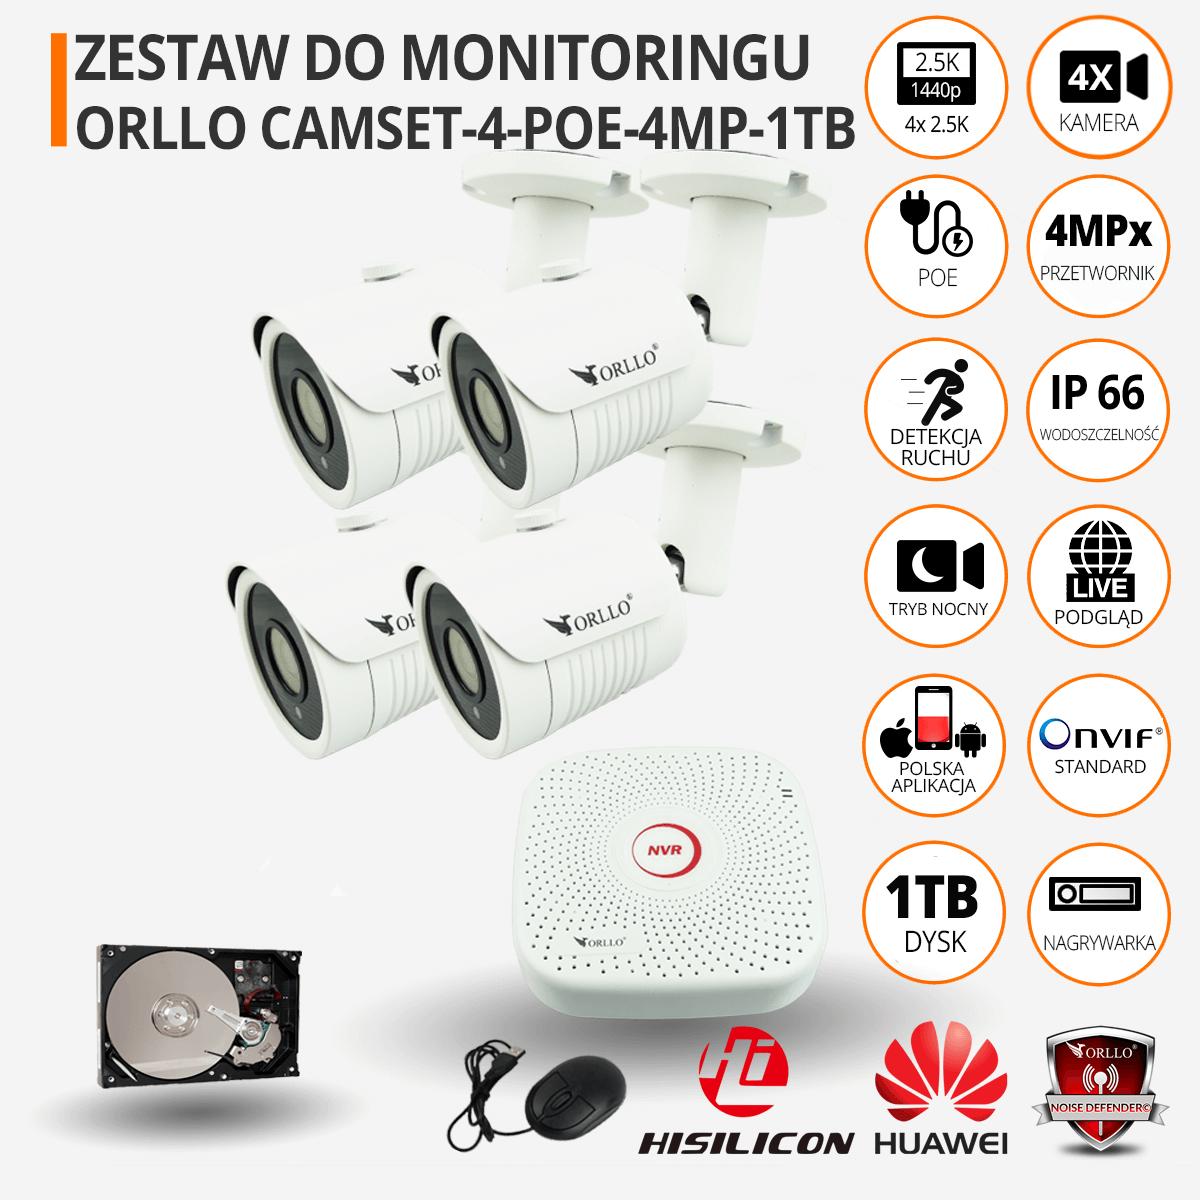 zestaw-kamer-domonitoringu-CAMSET-funkcje-orllo-pl